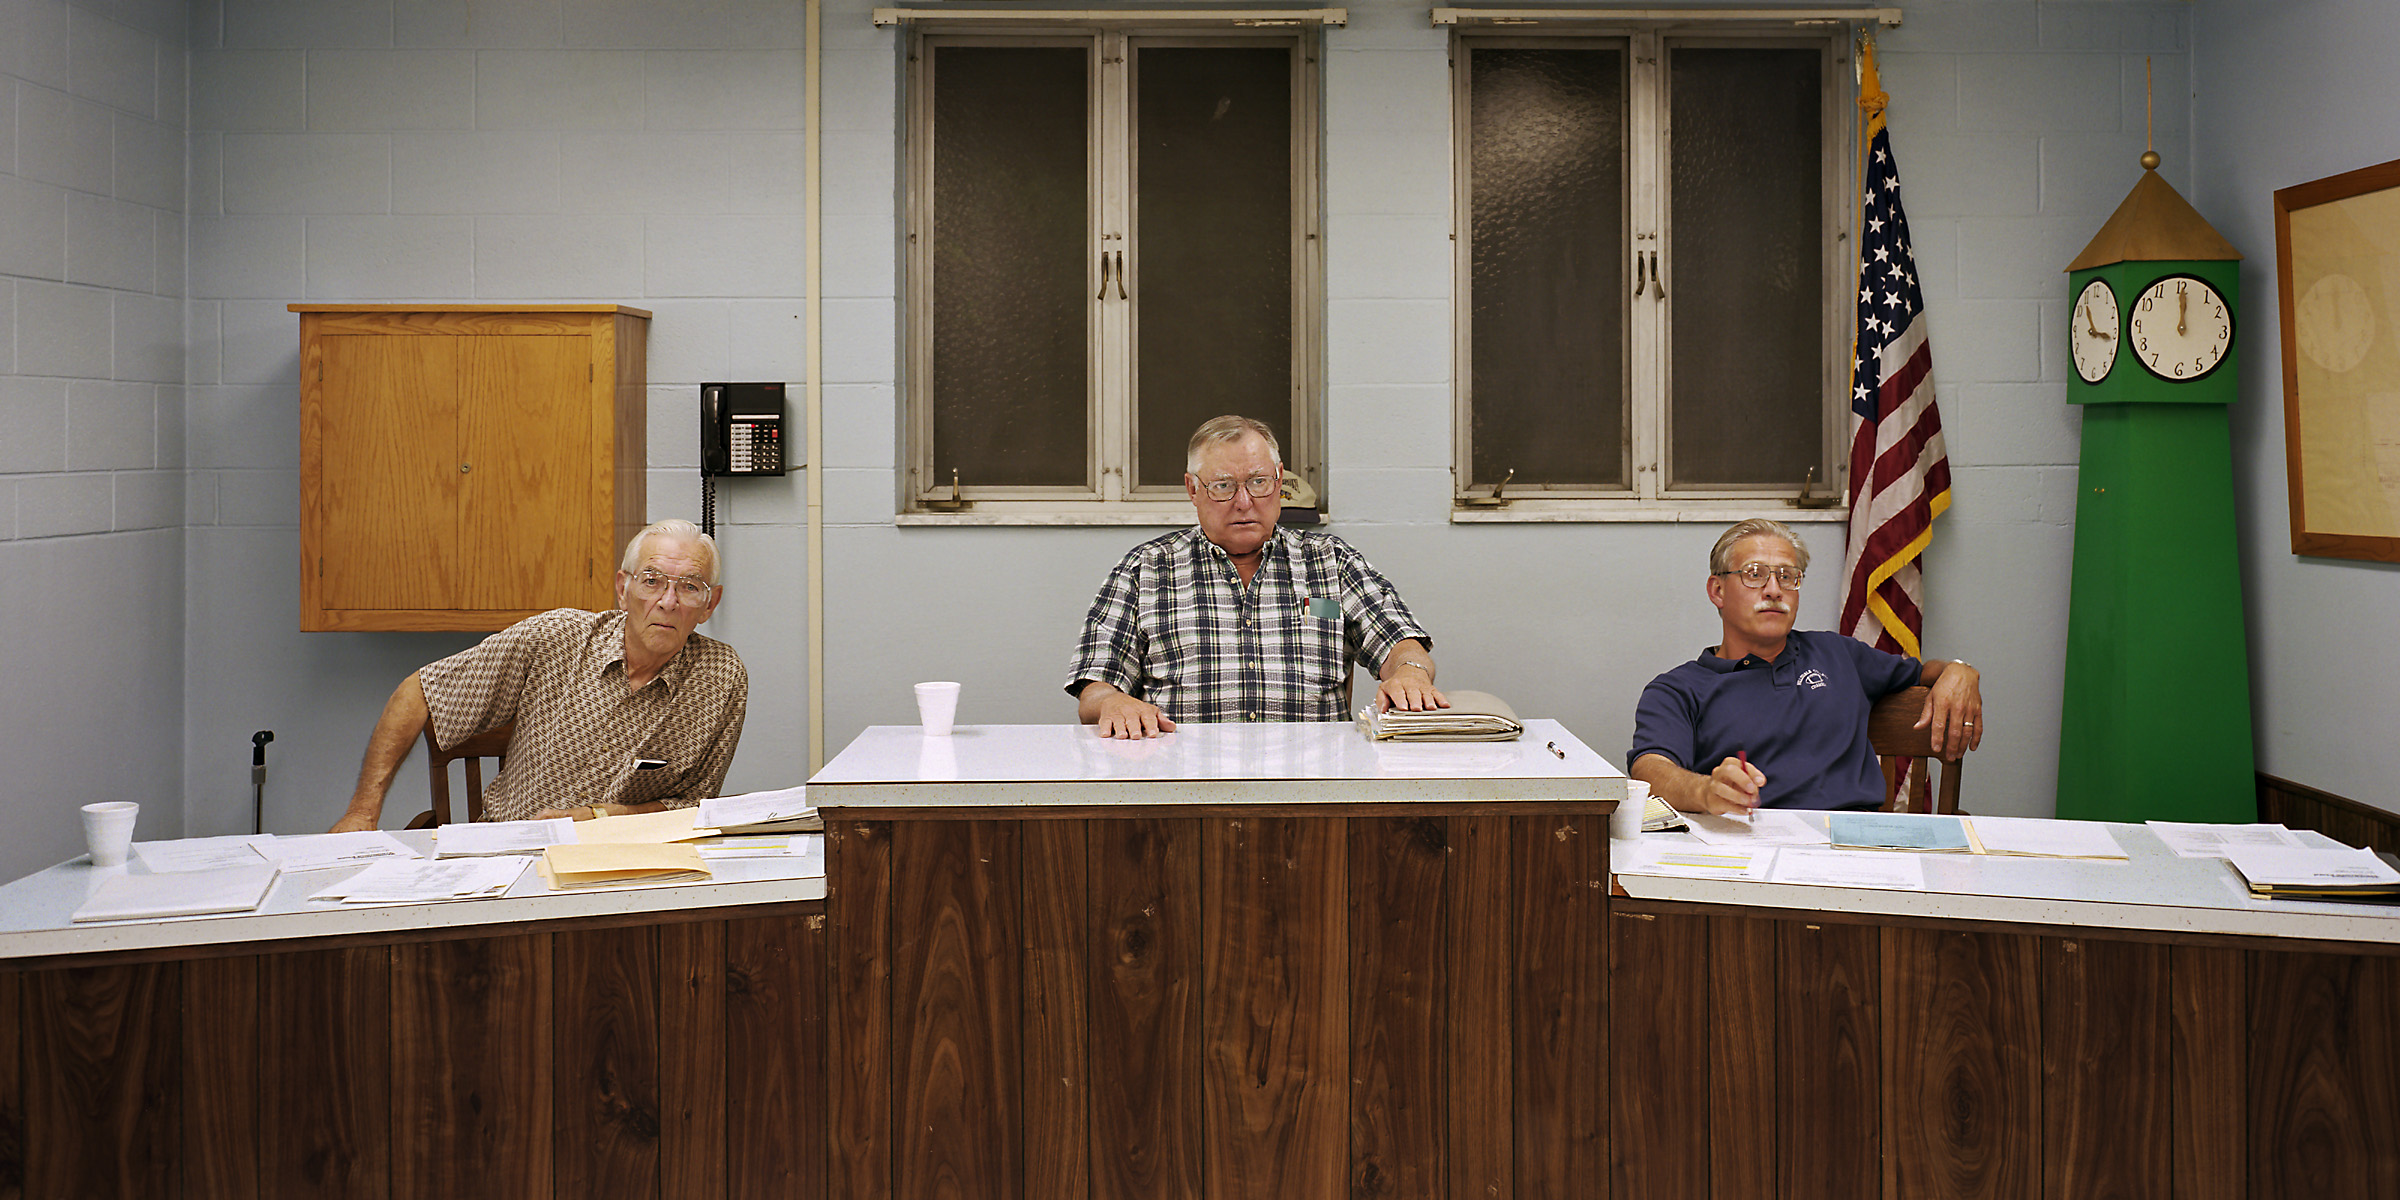 Markle, Indiana (population 1,228) Town Council, July 21, 1999 (L to R): Wayne Ridgley, Jay Fox (President), Jeff Stockman, 1999.